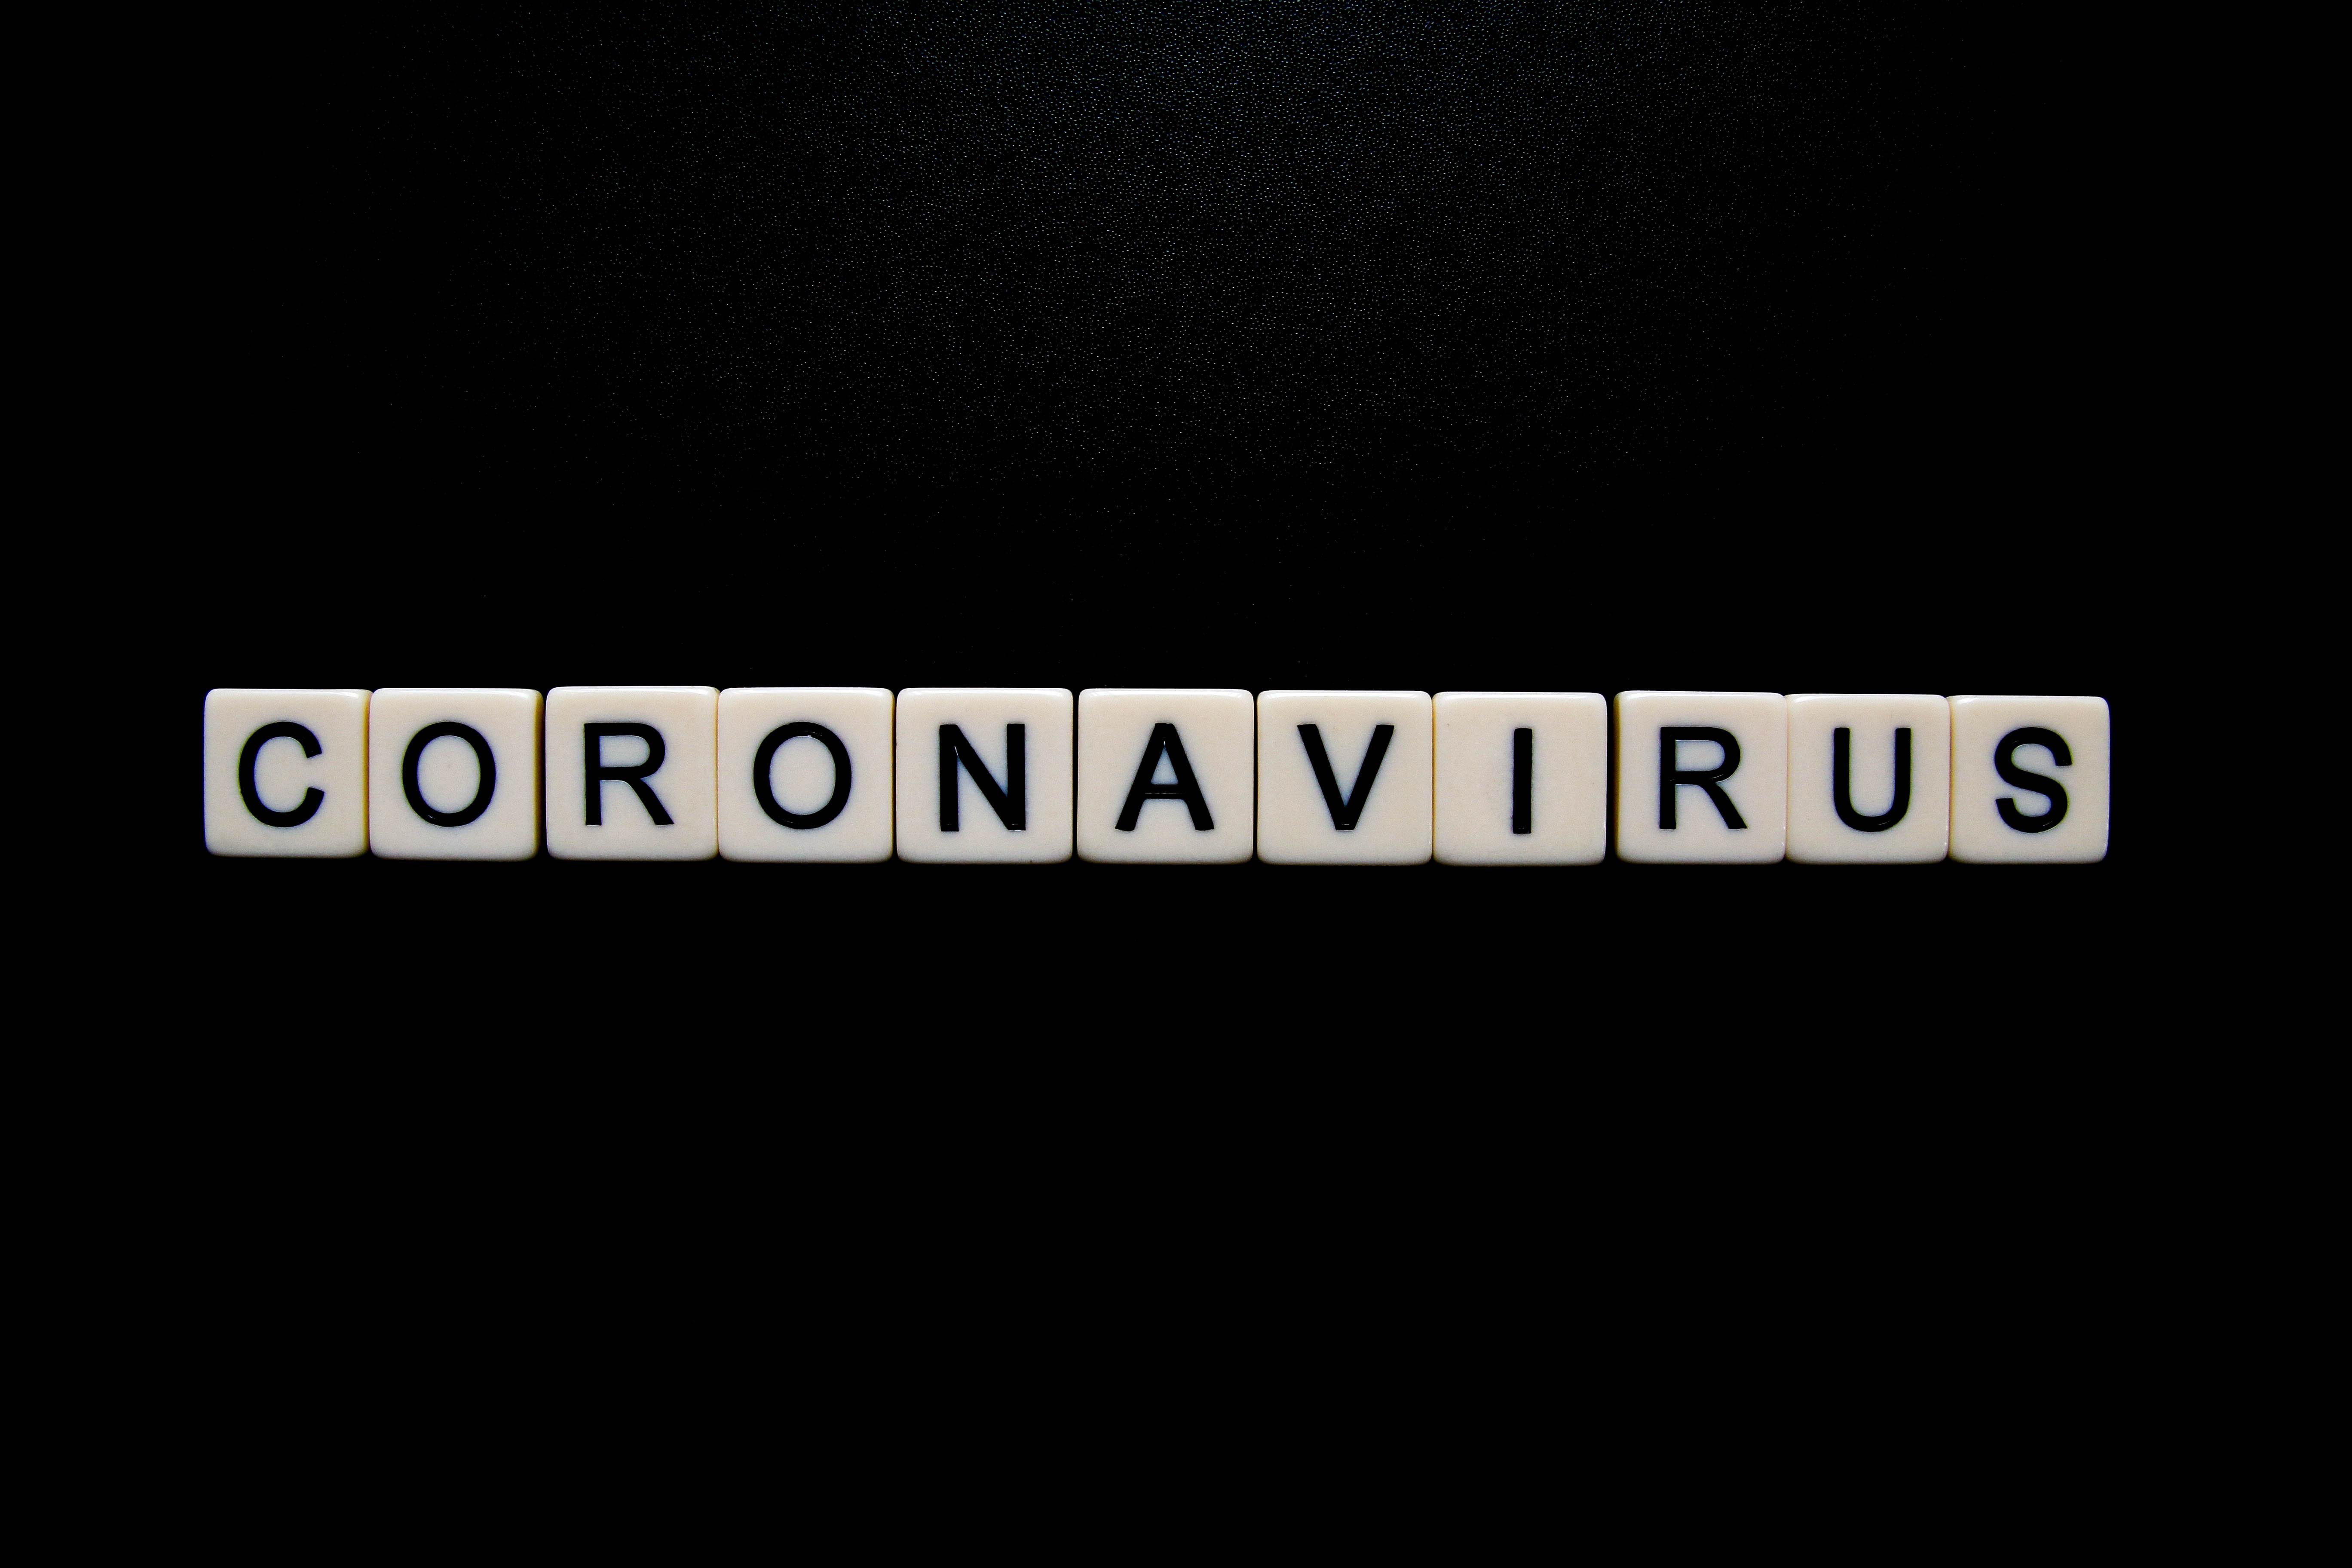 475, 475, Coronavirus, Coronavirus.jpg, 795325, https://riskboxuk.com/wp-content/uploads/2020/06/Coronavirus.jpg, https://riskboxuk.com/3-key-features-of-insurance-in-a-post-covid-world/coronavirus/, , 4, , , coronavirus, inherit, 467, 2020-06-19 15:56:44, 2020-06-19 15:56:44, 0, image/jpeg, image, jpeg, https://riskboxuk.com/wp-includes/images/media/default.png, 5472, 3648, Array